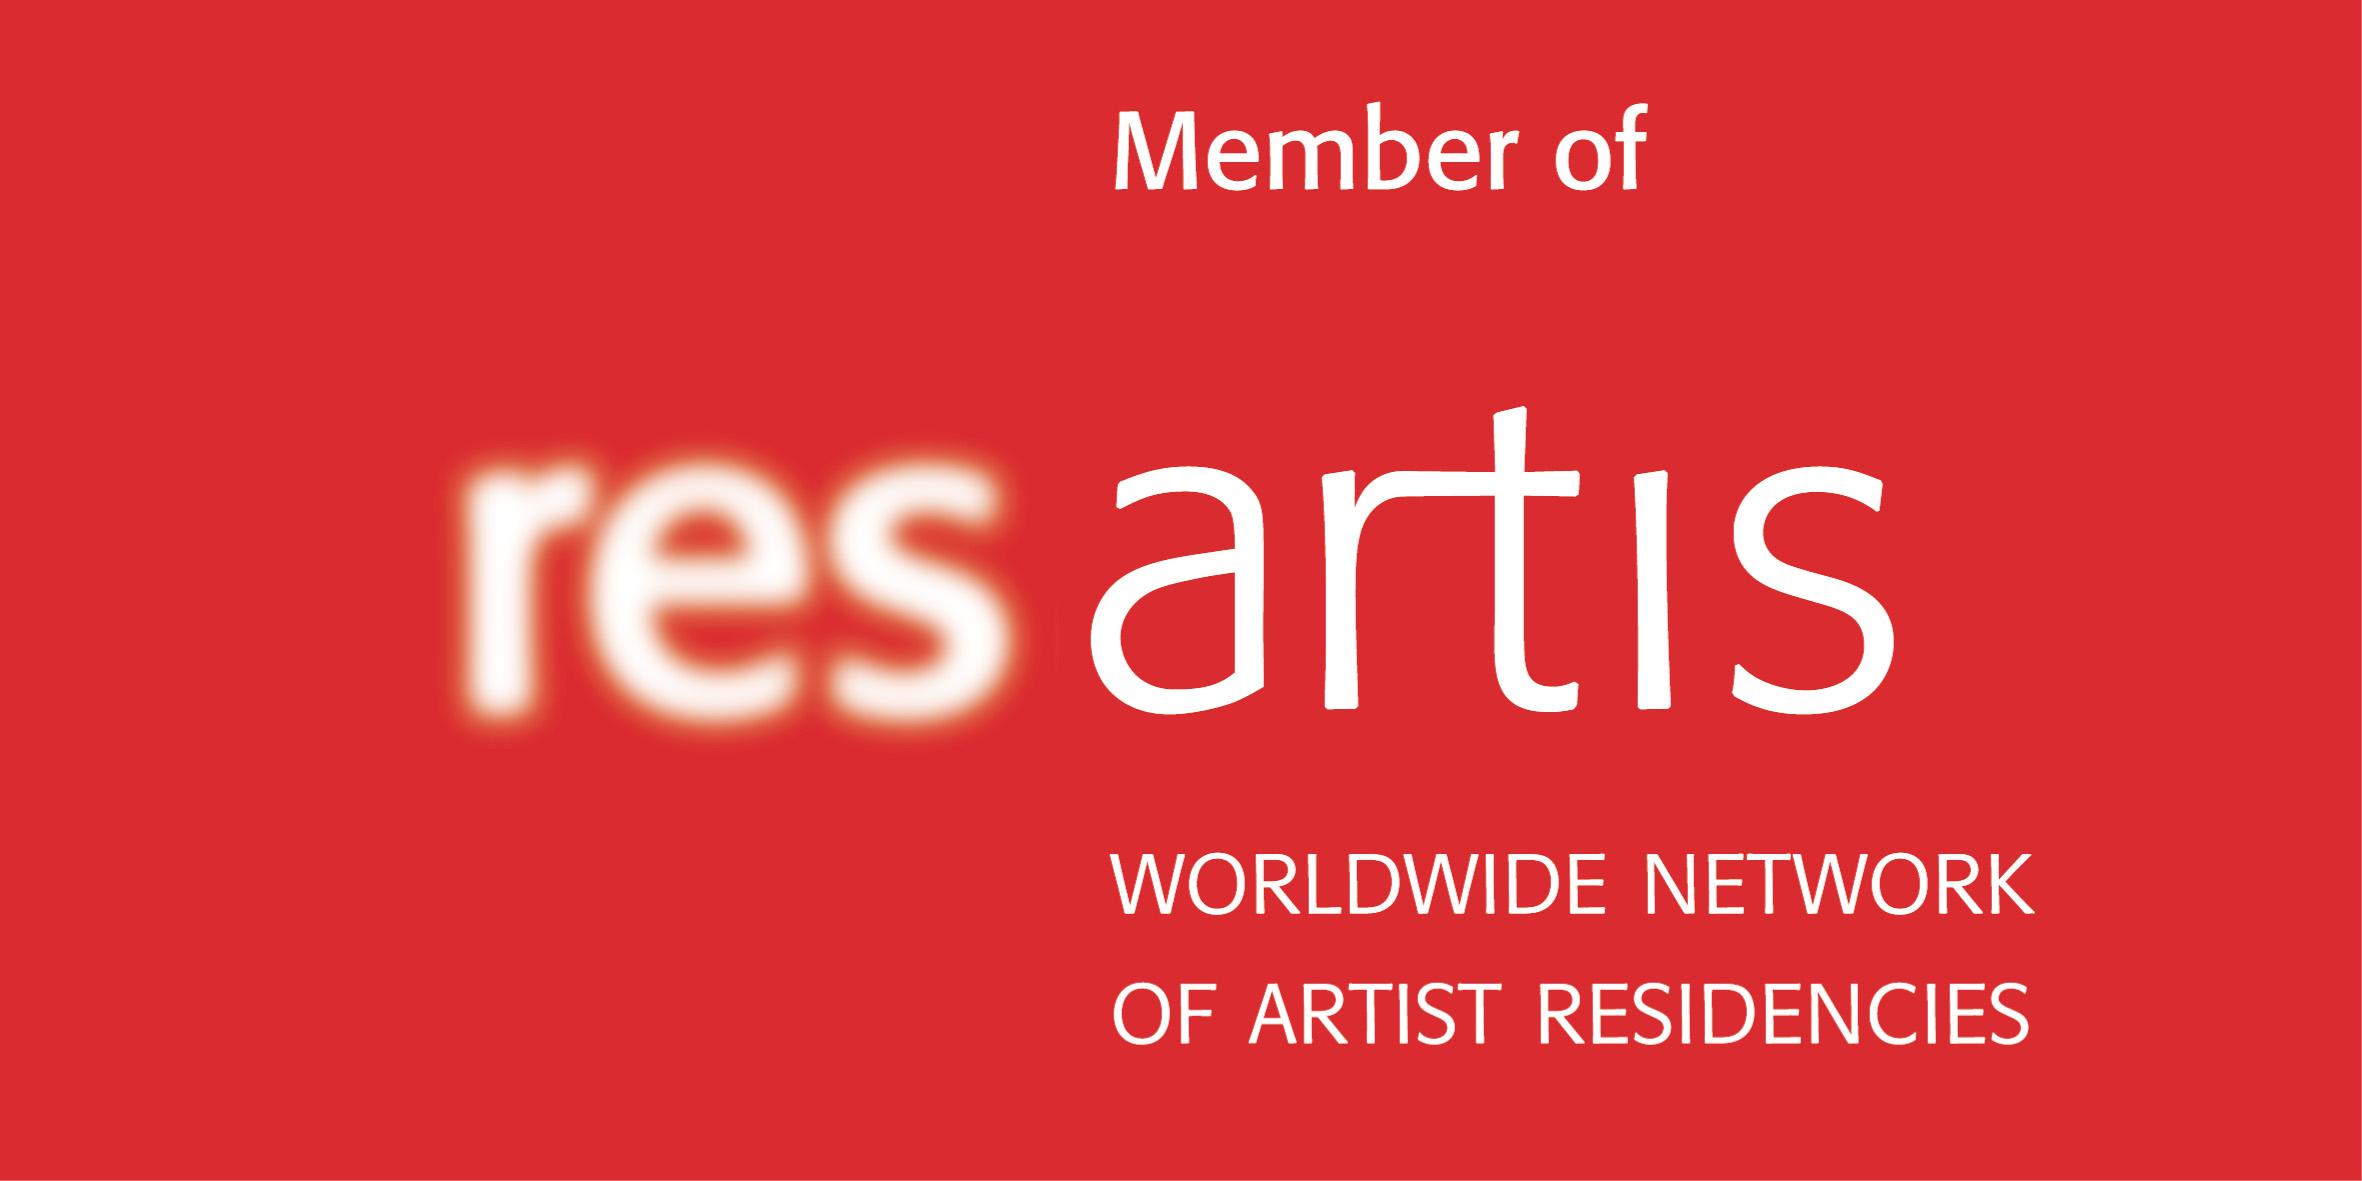 res_artis_member_logo